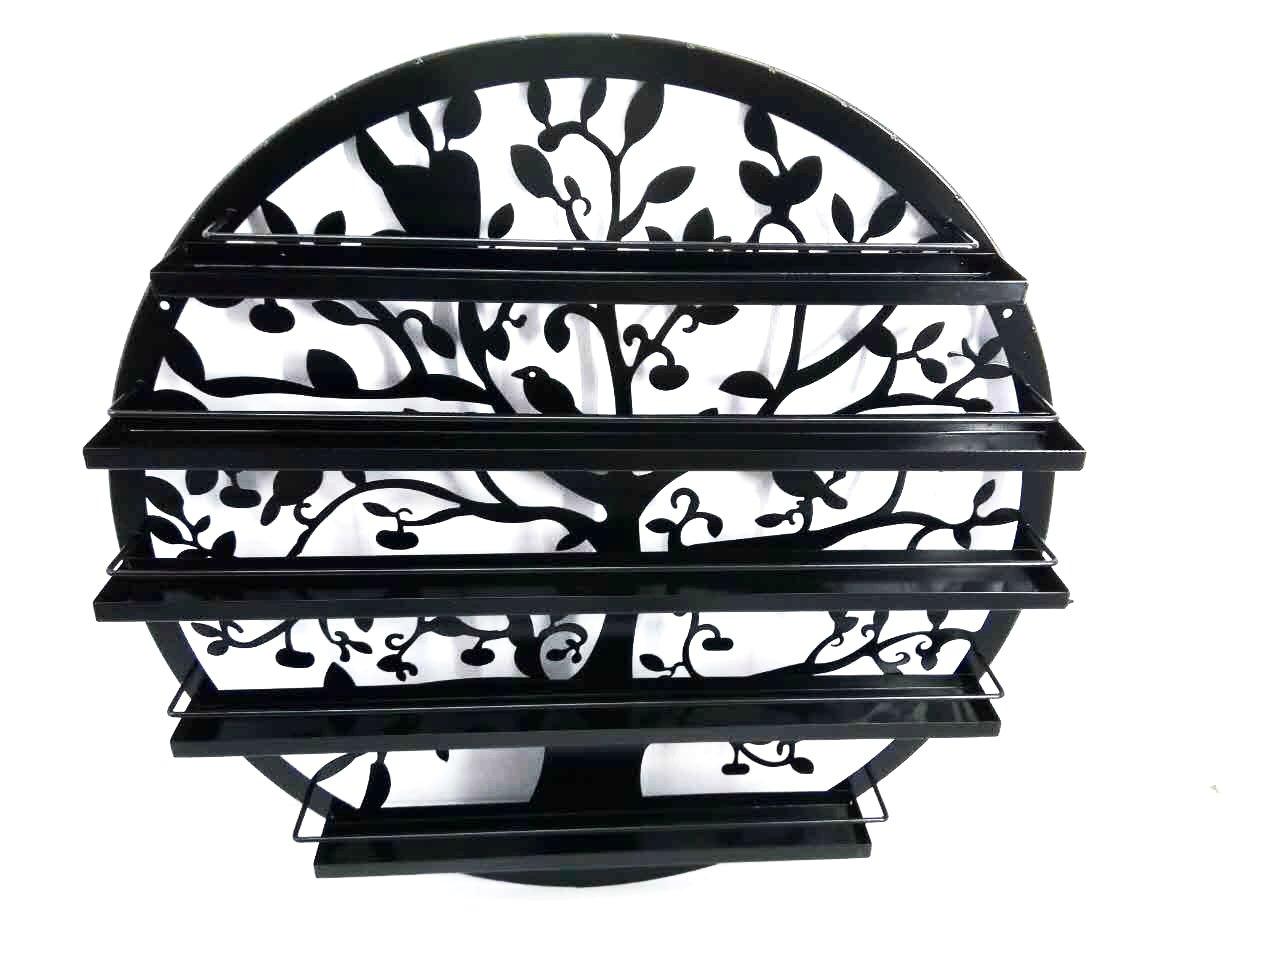 FixtureDisplays Wall Mounted 5 Tier Nail Polish Rack Holder, Tree Silhouette Round Metal Salon Wall Art Display, Black 16785-NPF